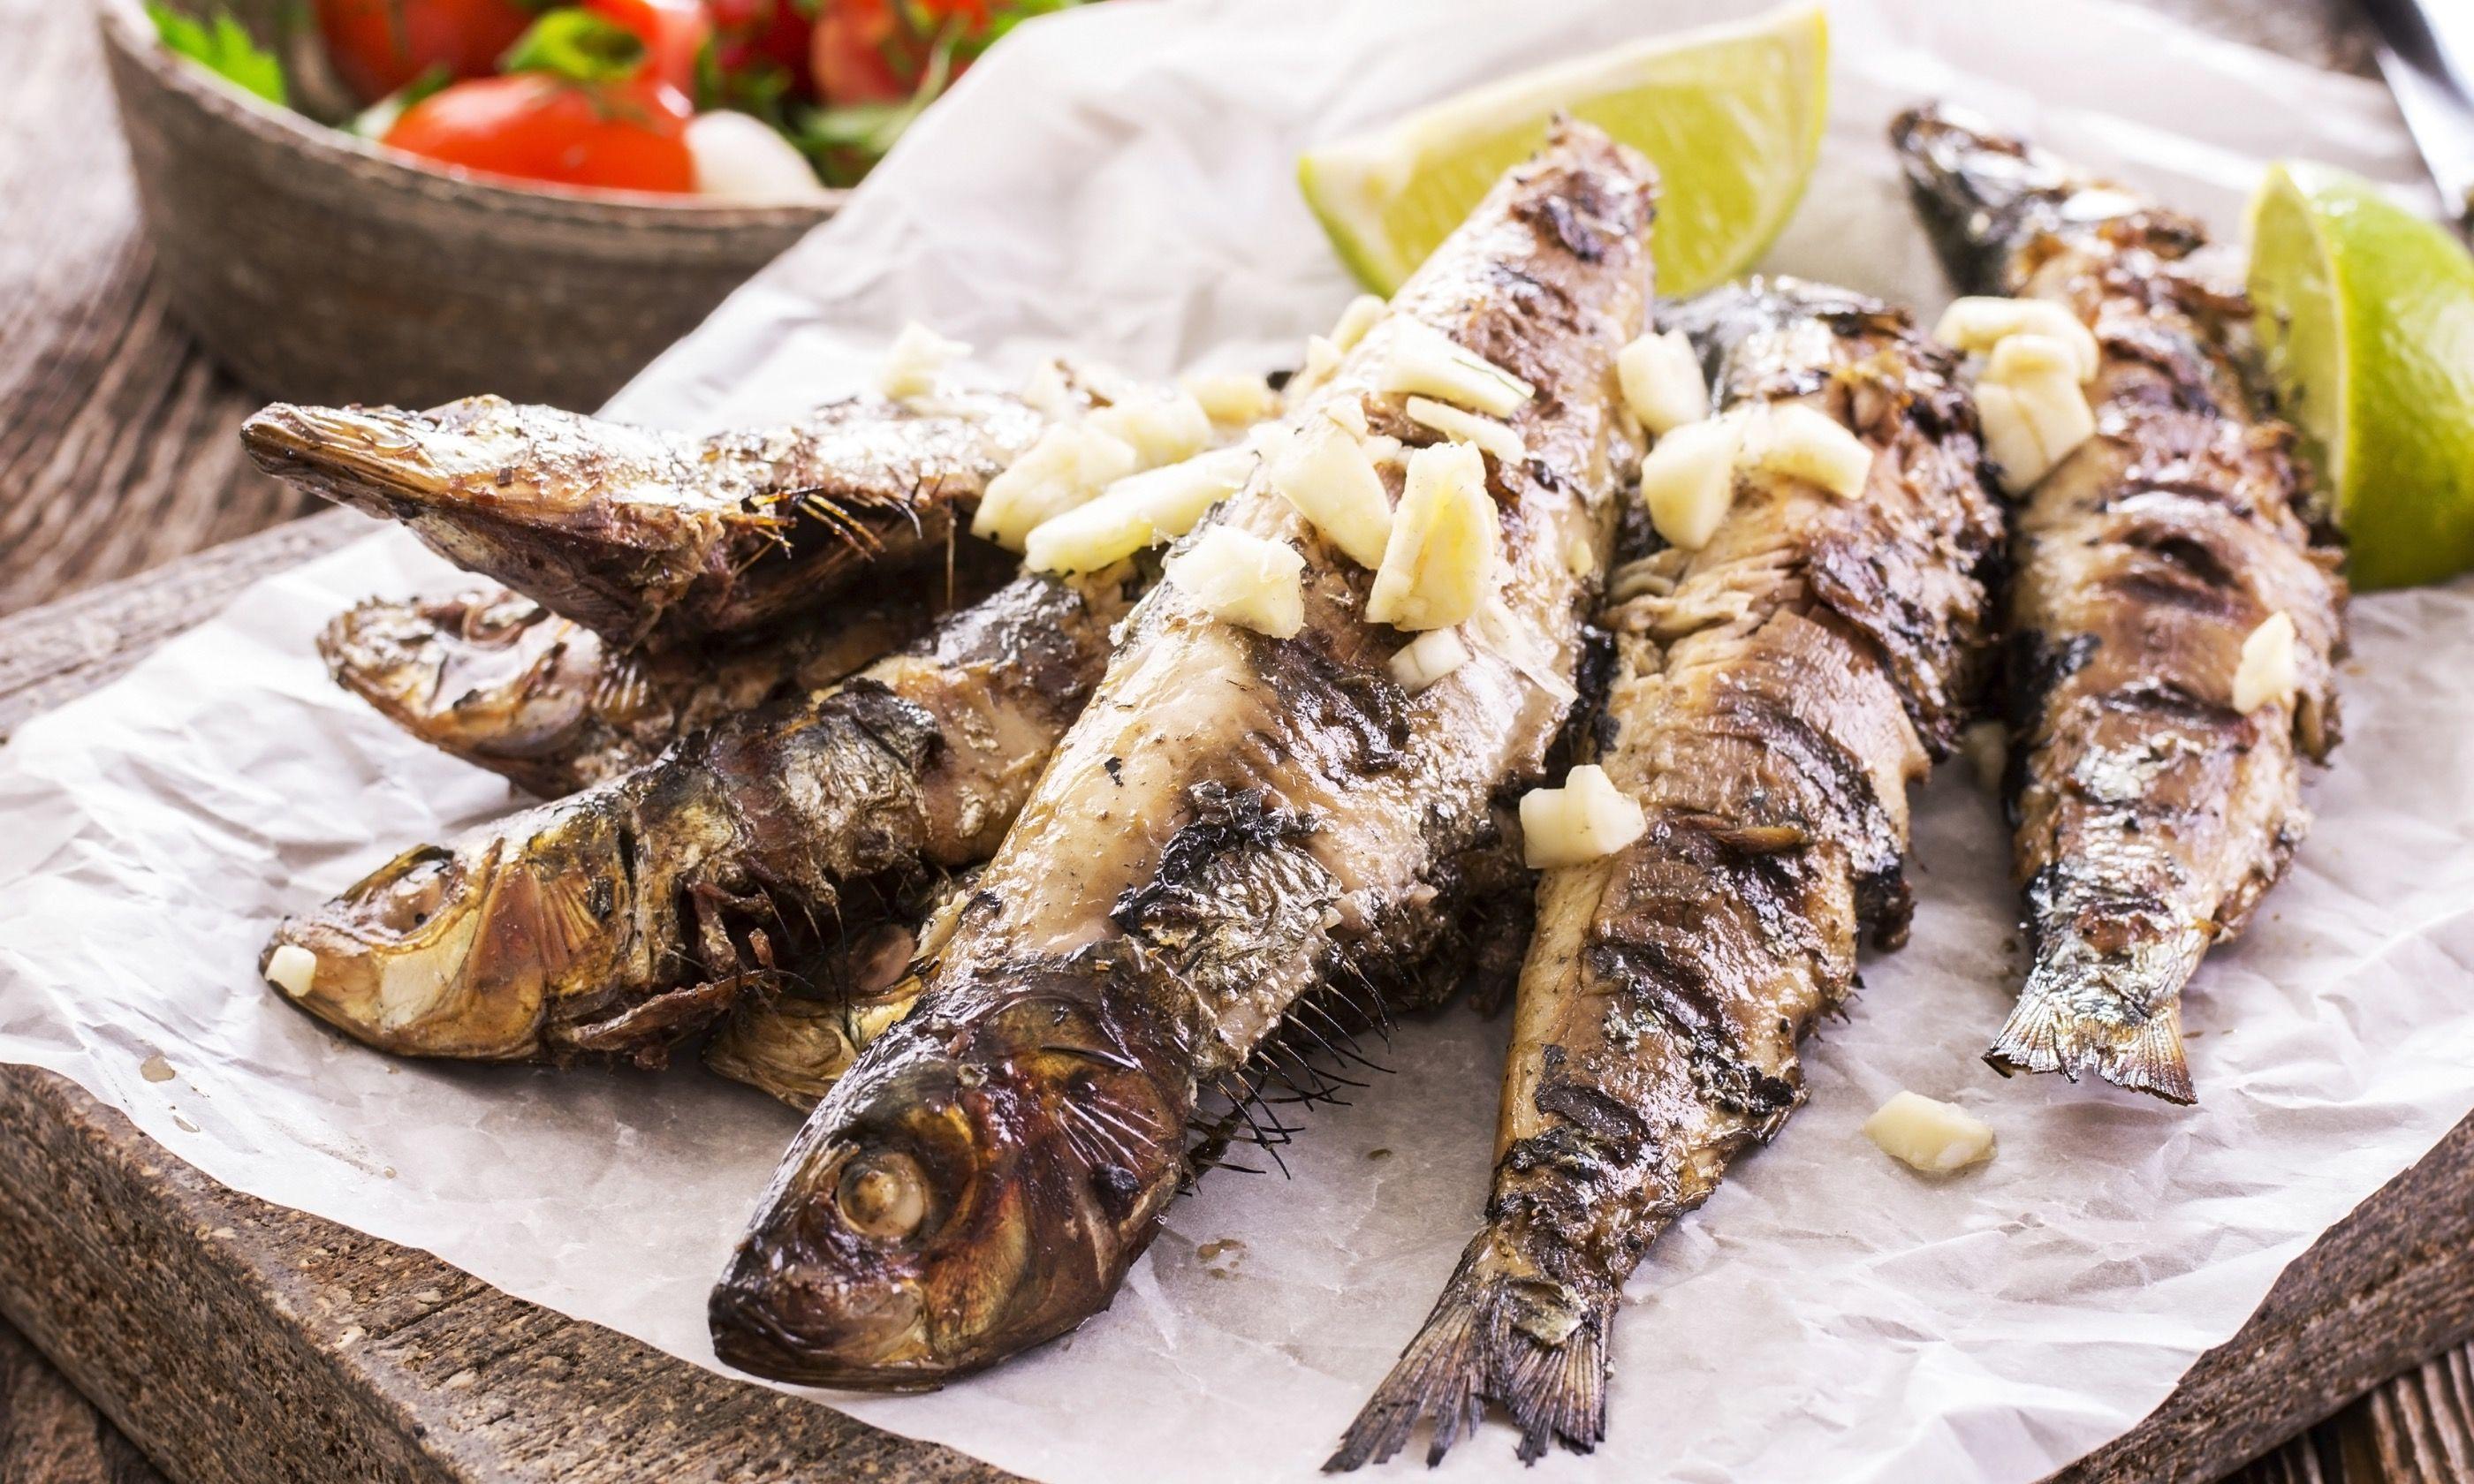 Grilled sardines (Dreamstime)